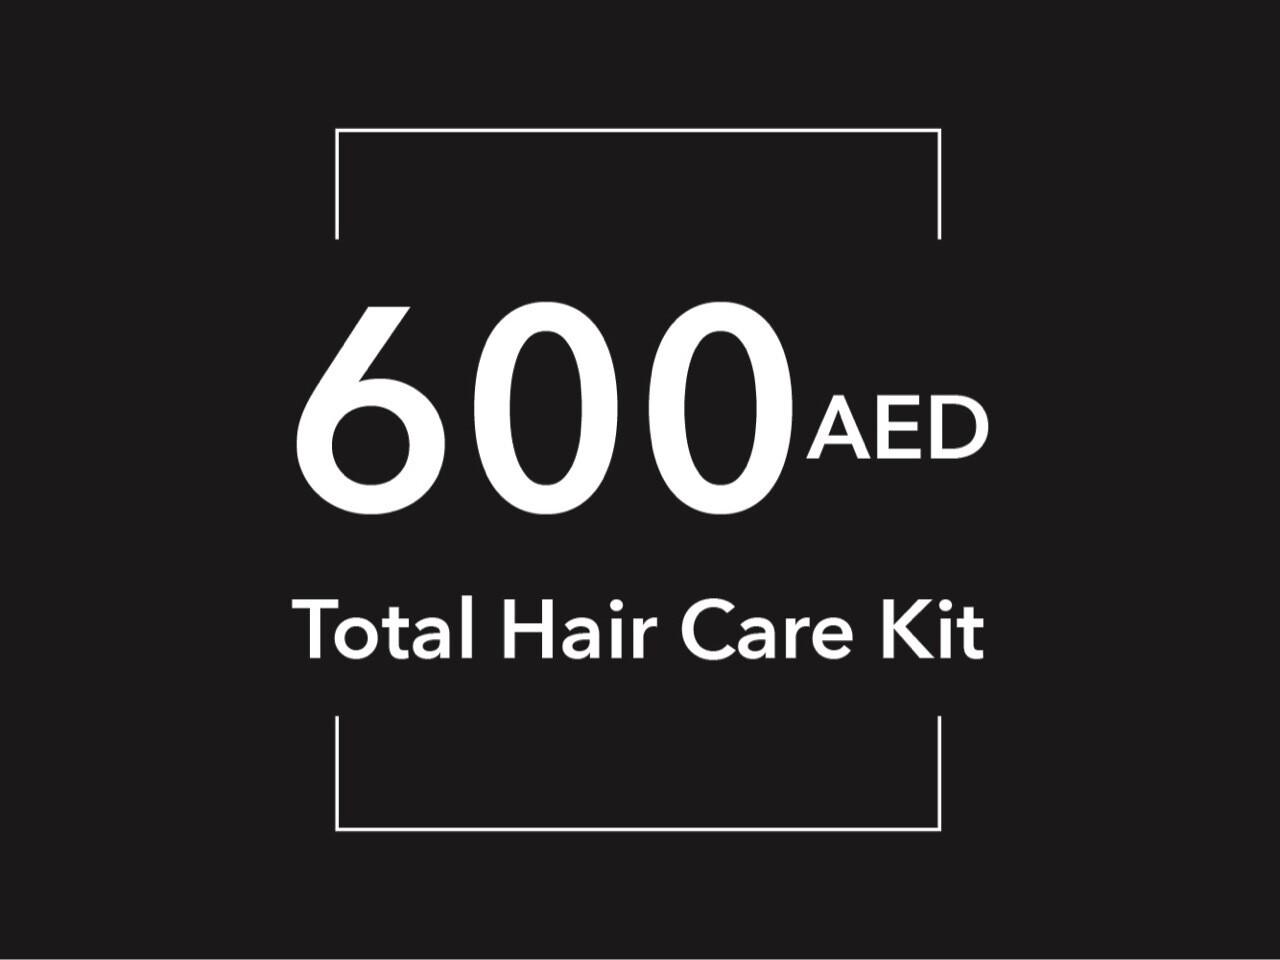 Total Hair Care Kit